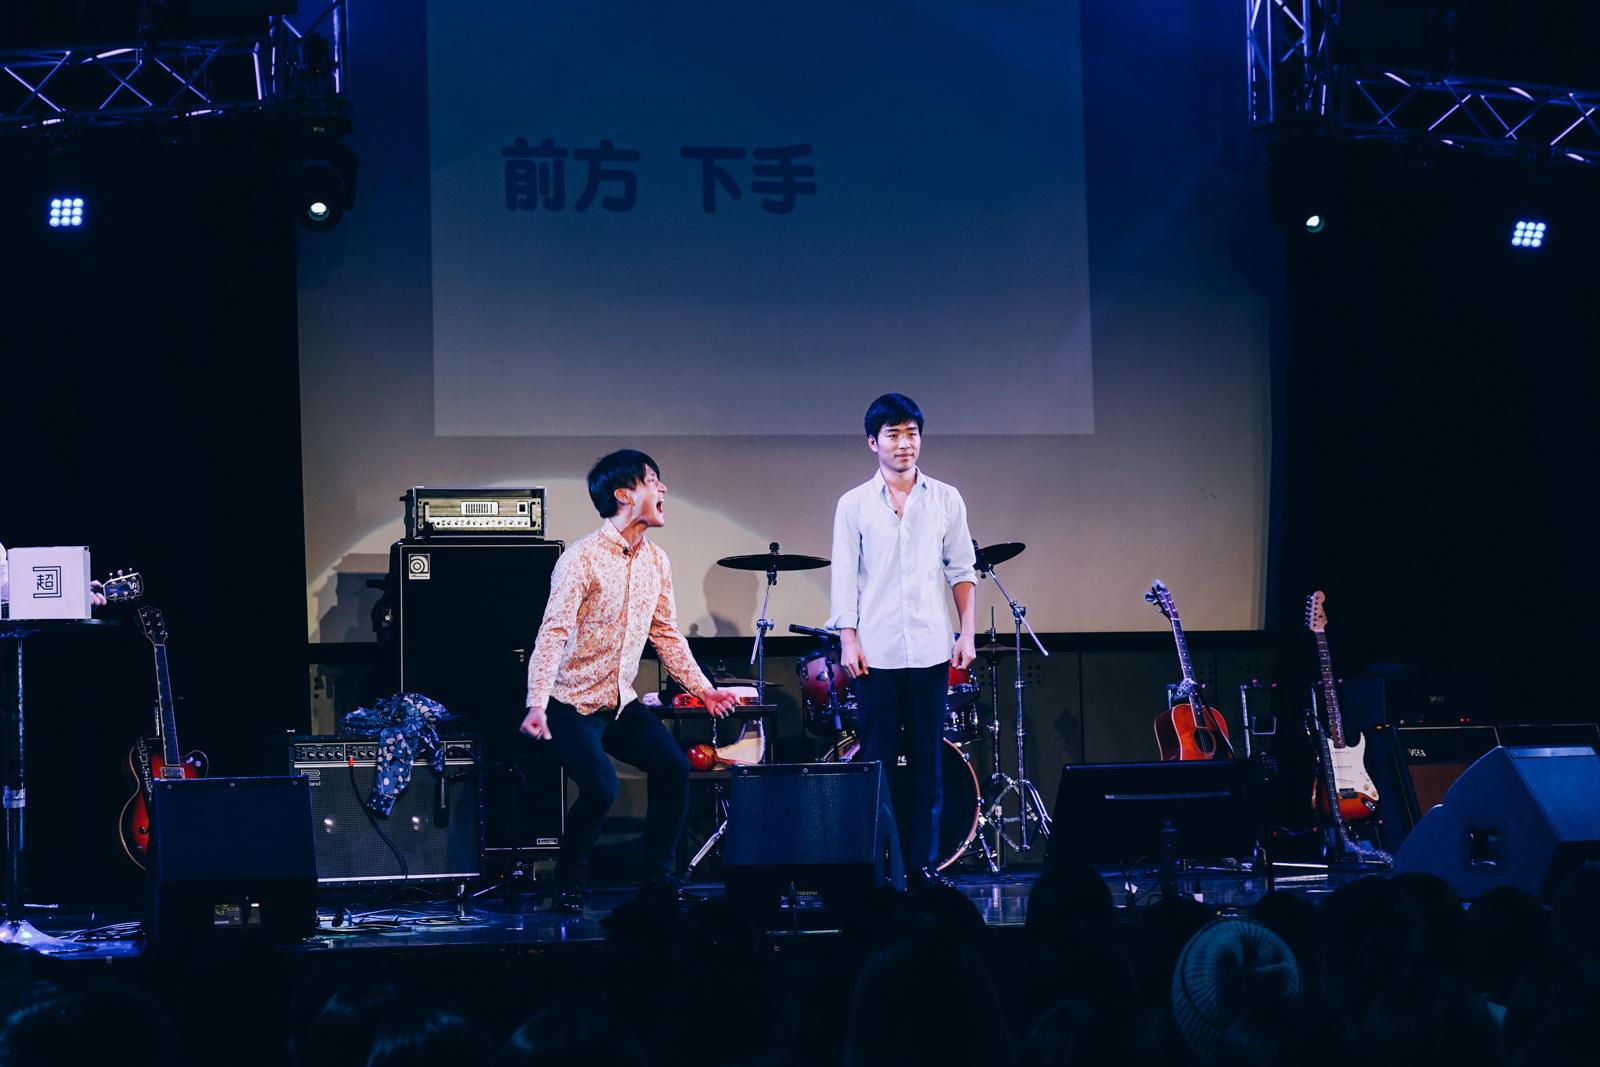 http://news.yoshimoto.co.jp/20161229013202-52046b53fa278a94139aa1e83488d636e5755780.jpg